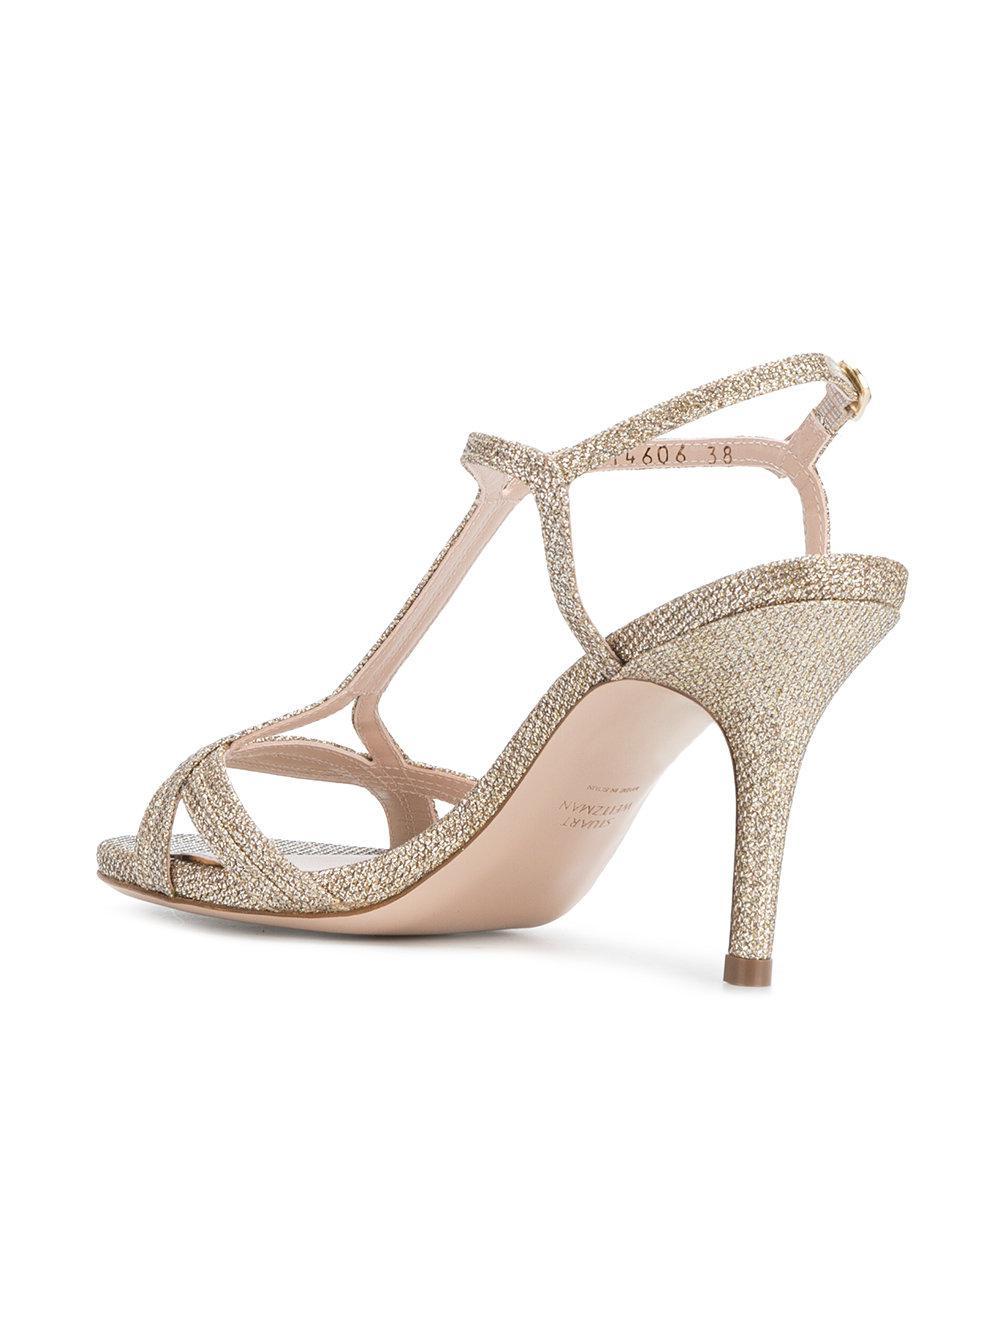 Sunny sandals - Metallic Stuart Weitzman qTeMnOGb